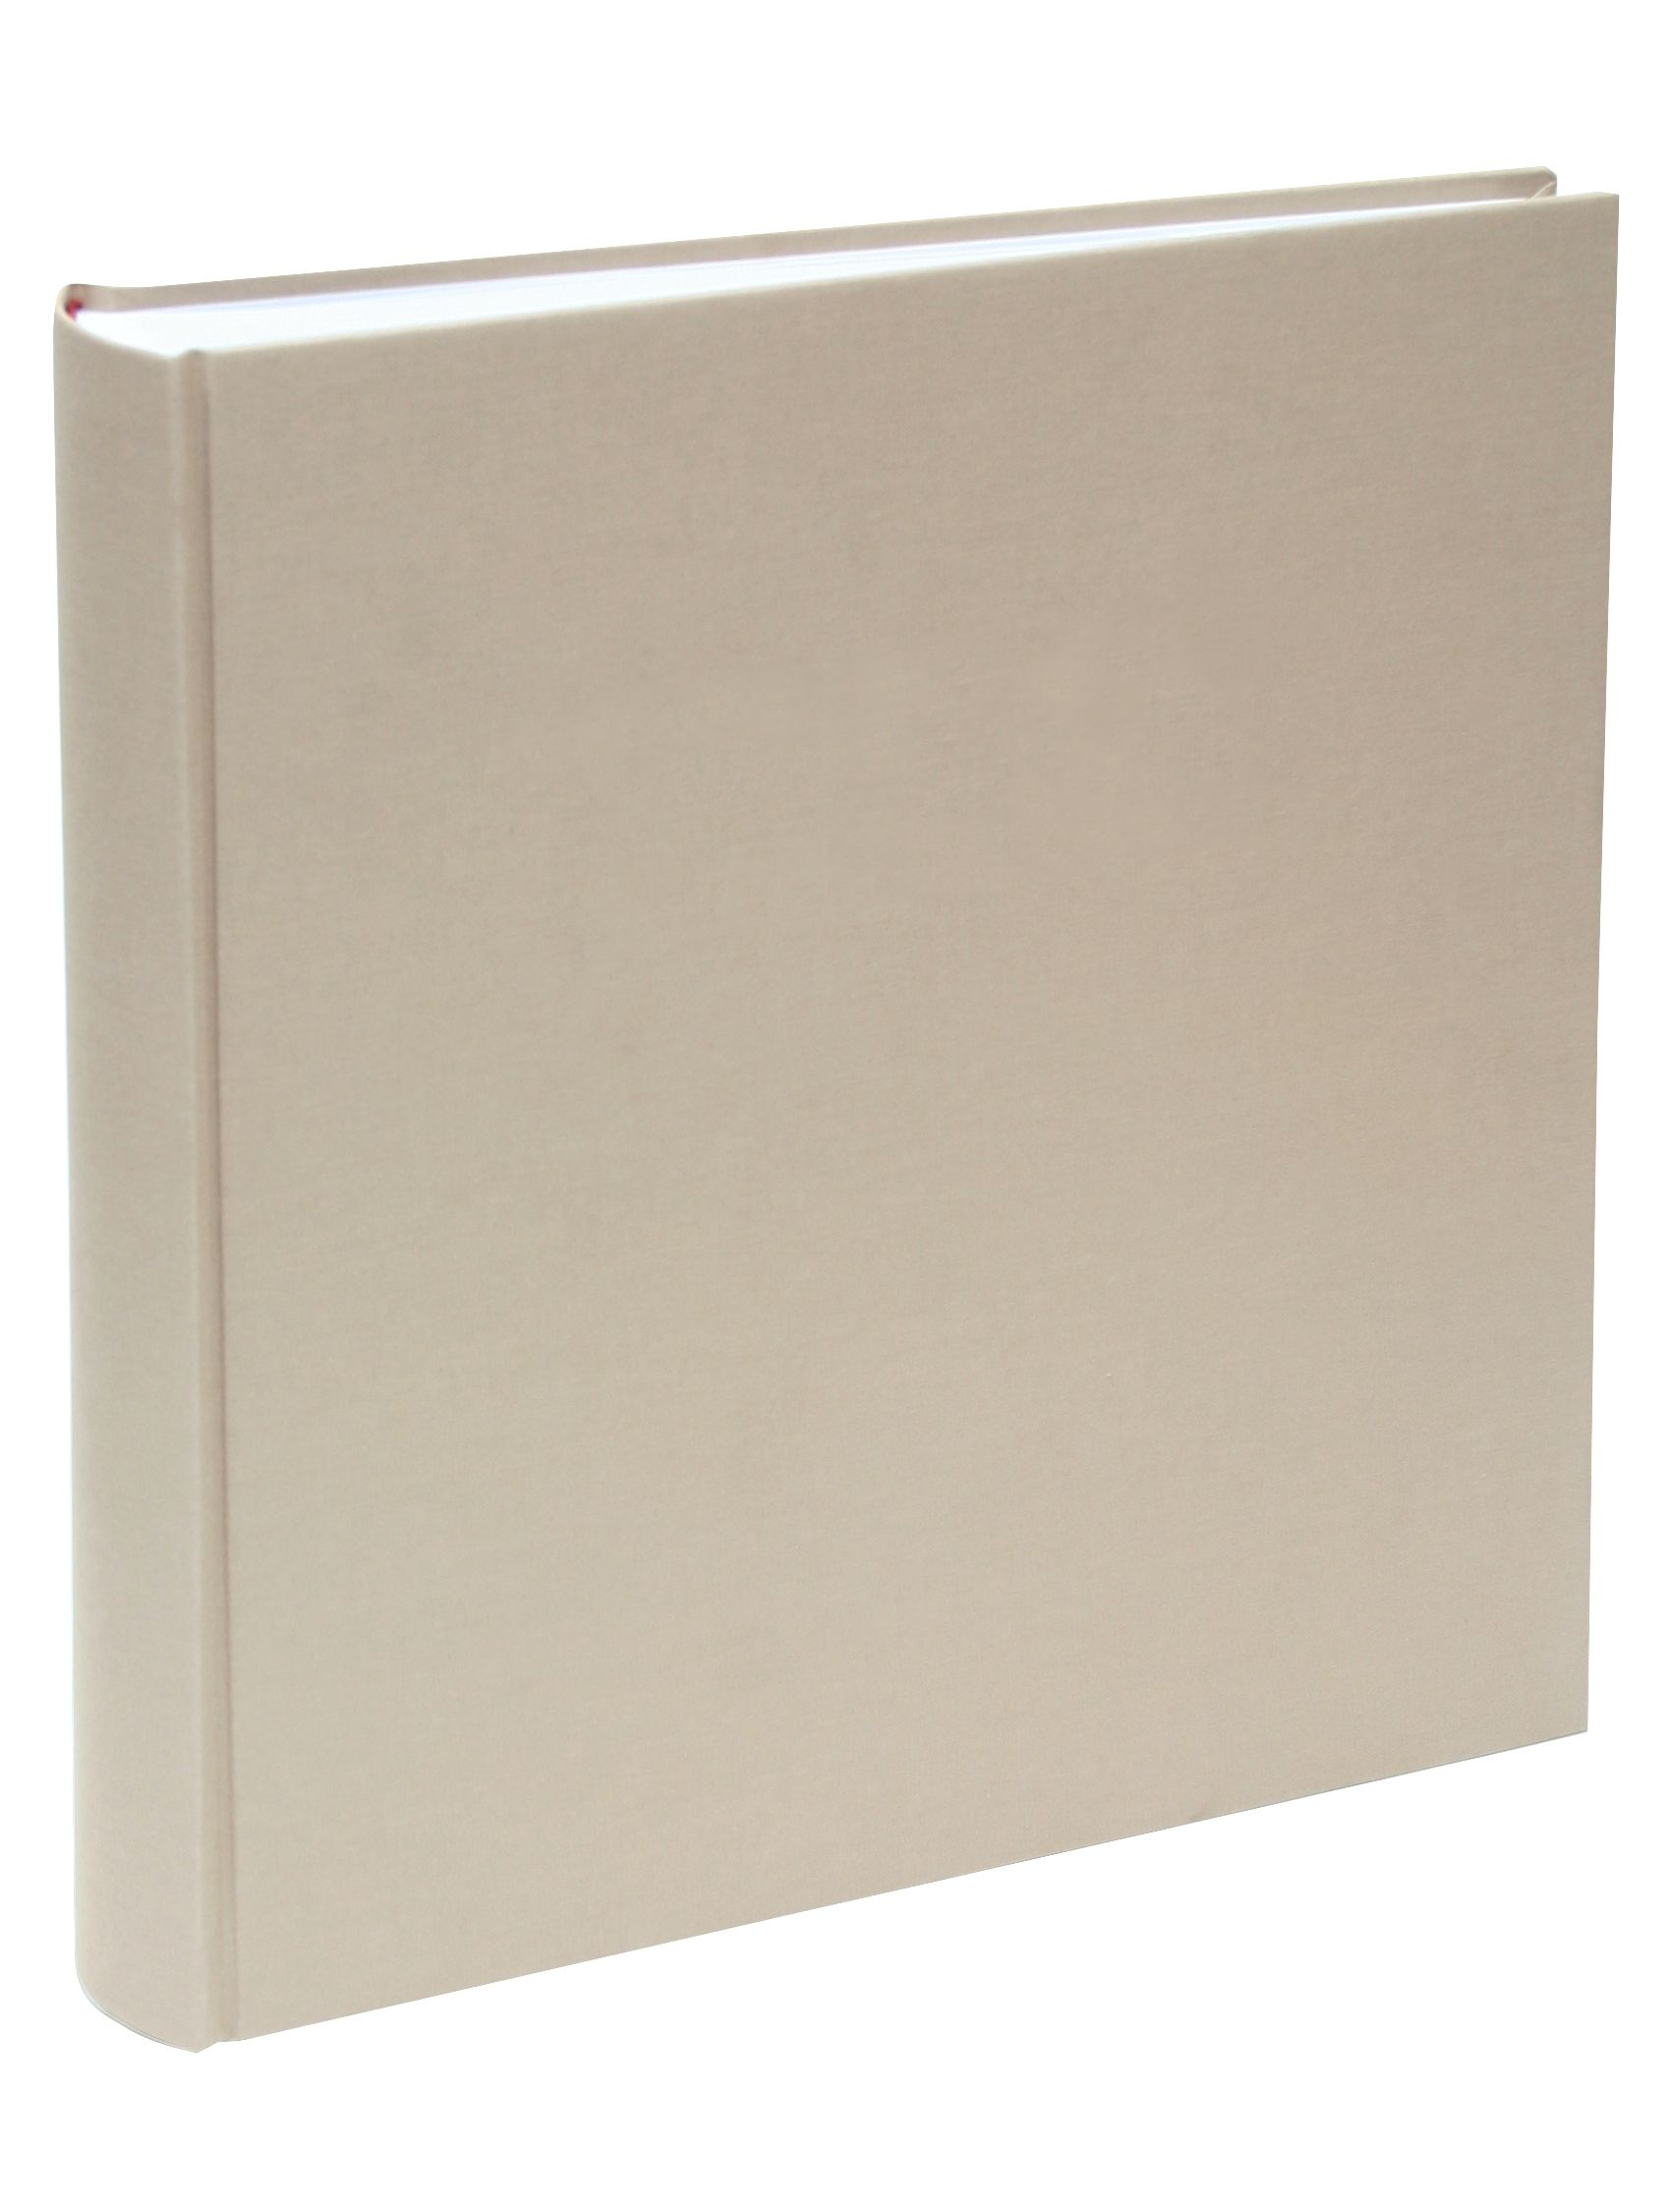 kleefalbum beige, linnen, 100 bladzijden A10D30 100SI